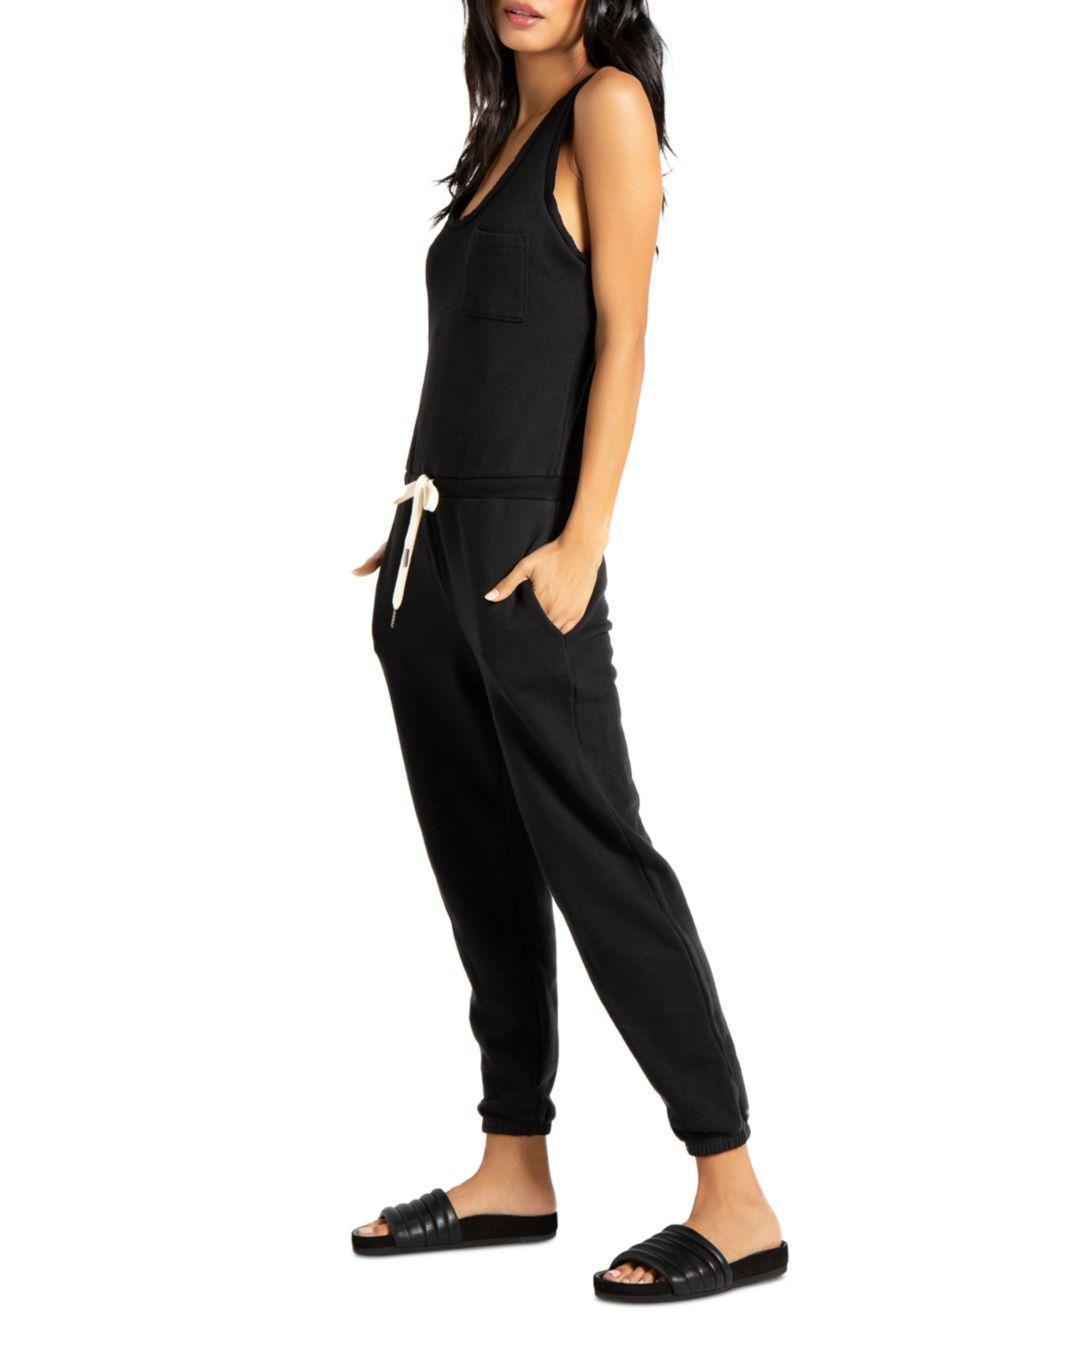 5576d6373d0c ... N Philanthropy World Sleeveless Knit Jumpsuit - Lyst. View fullscreen